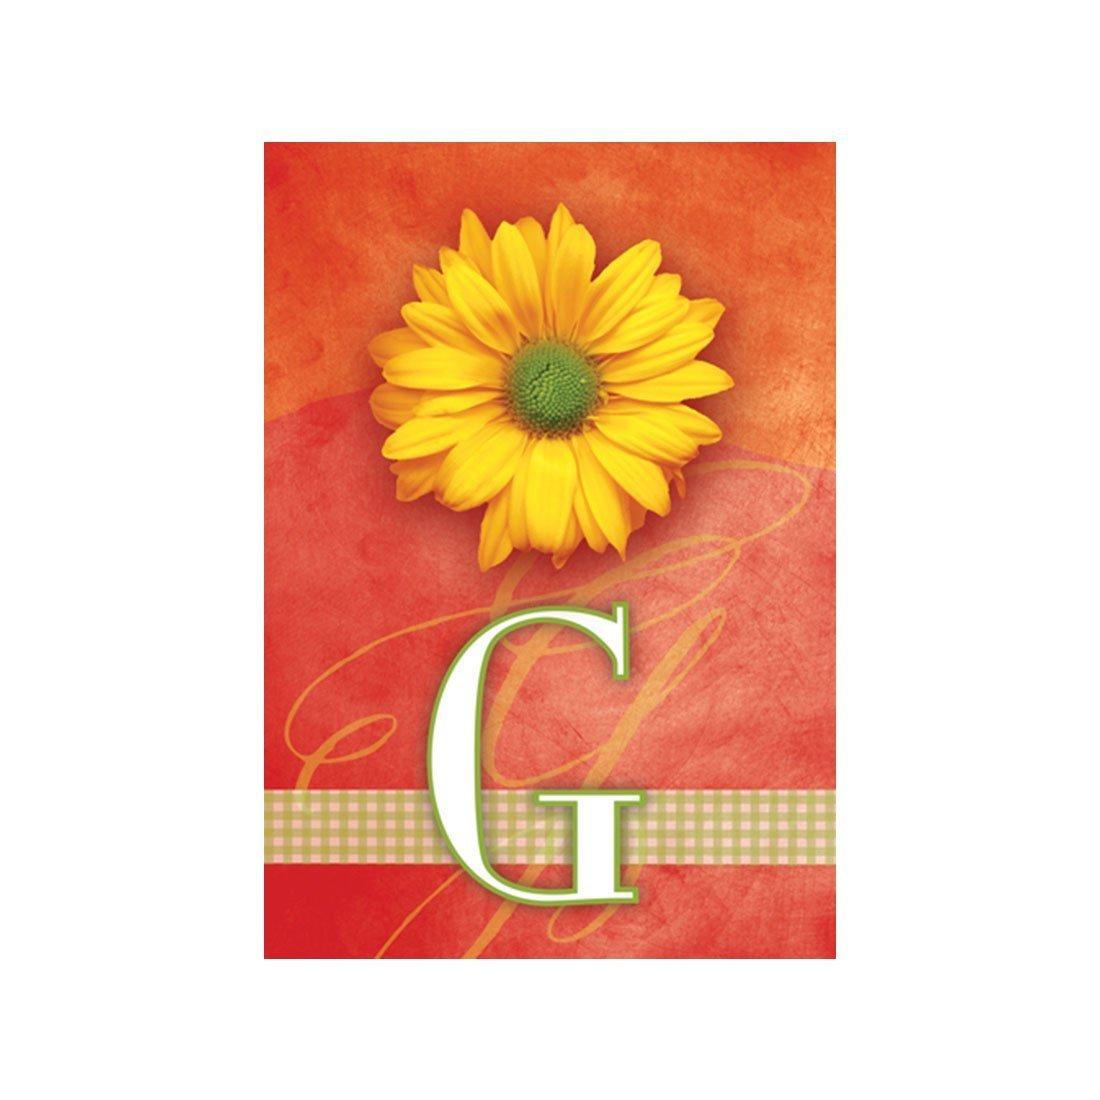 Buy Lvsure Flag Yellow Daisy Monogram G Garden Flags Decorative